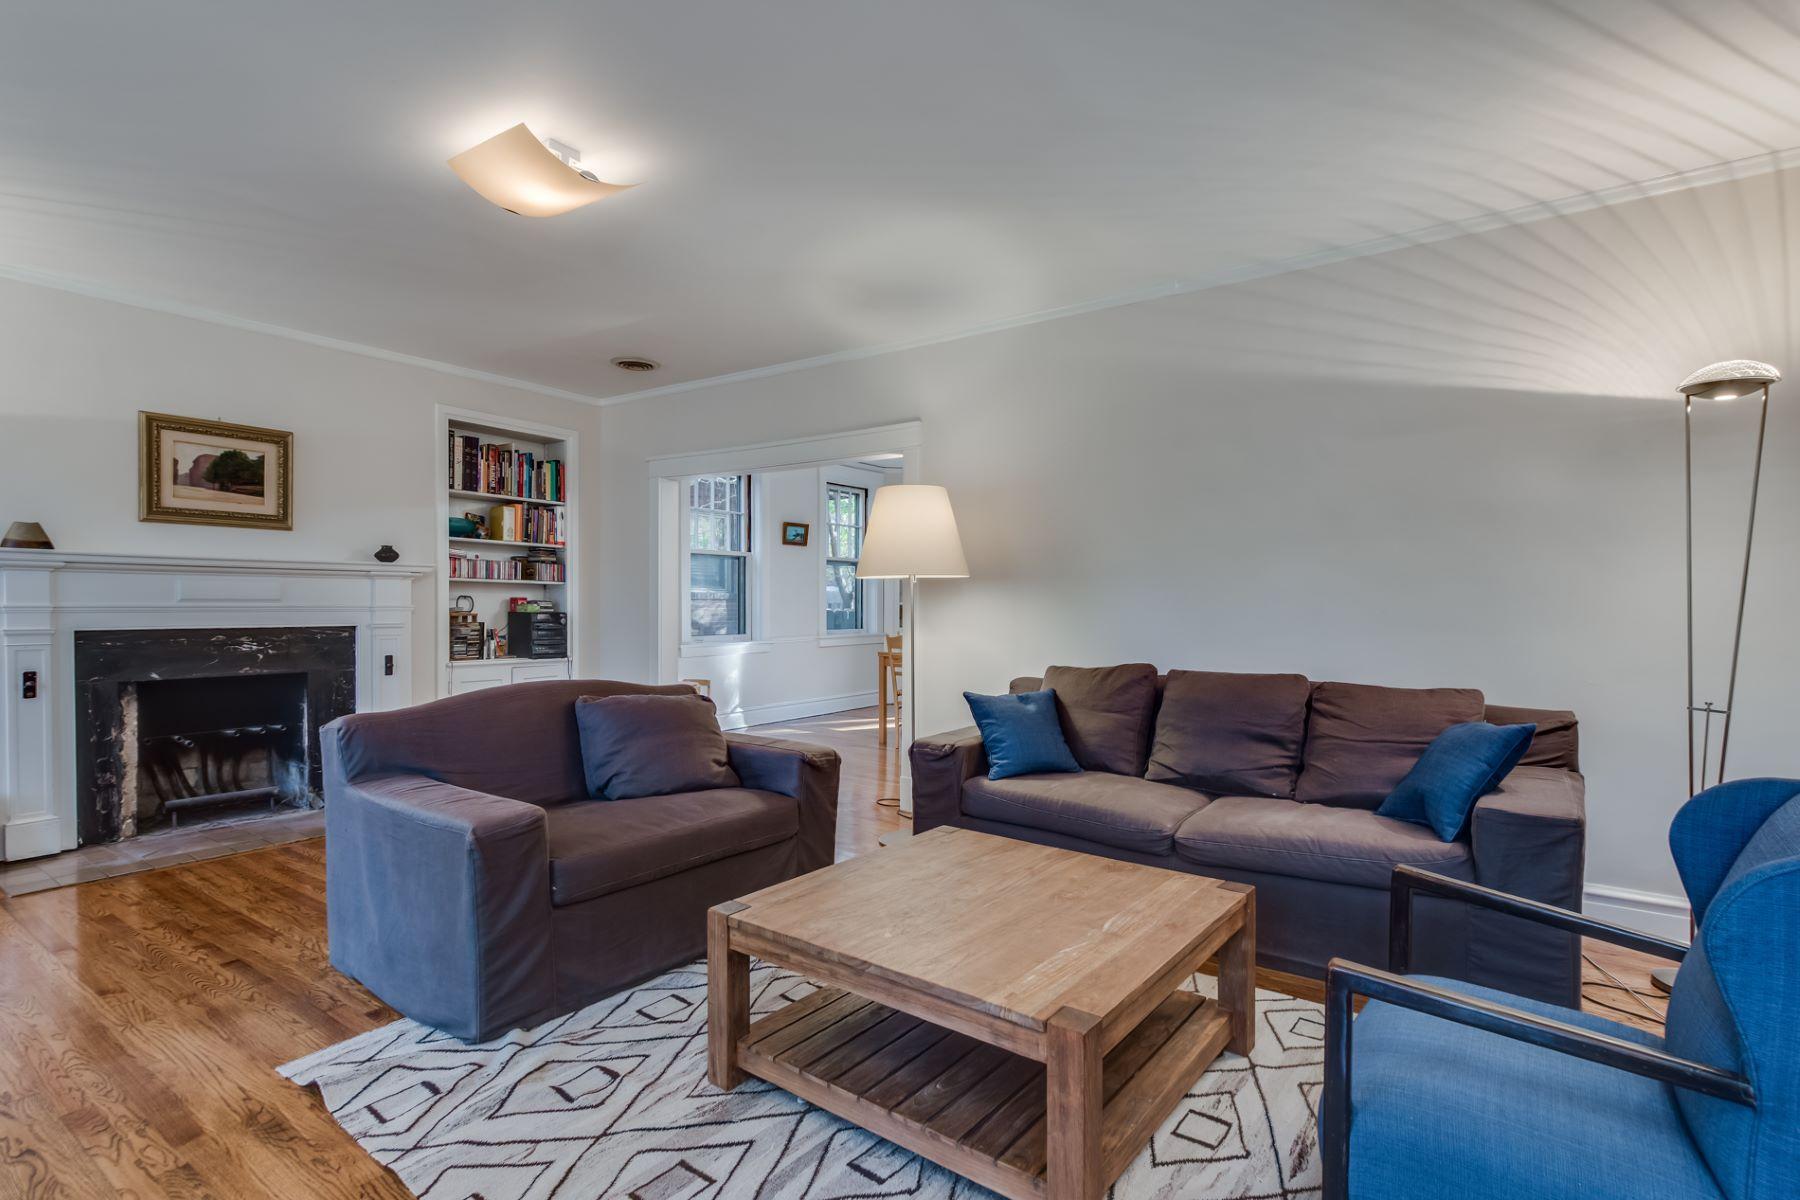 Additional photo for property listing at 430 Melville Ave University City, Missouri 63130 United States